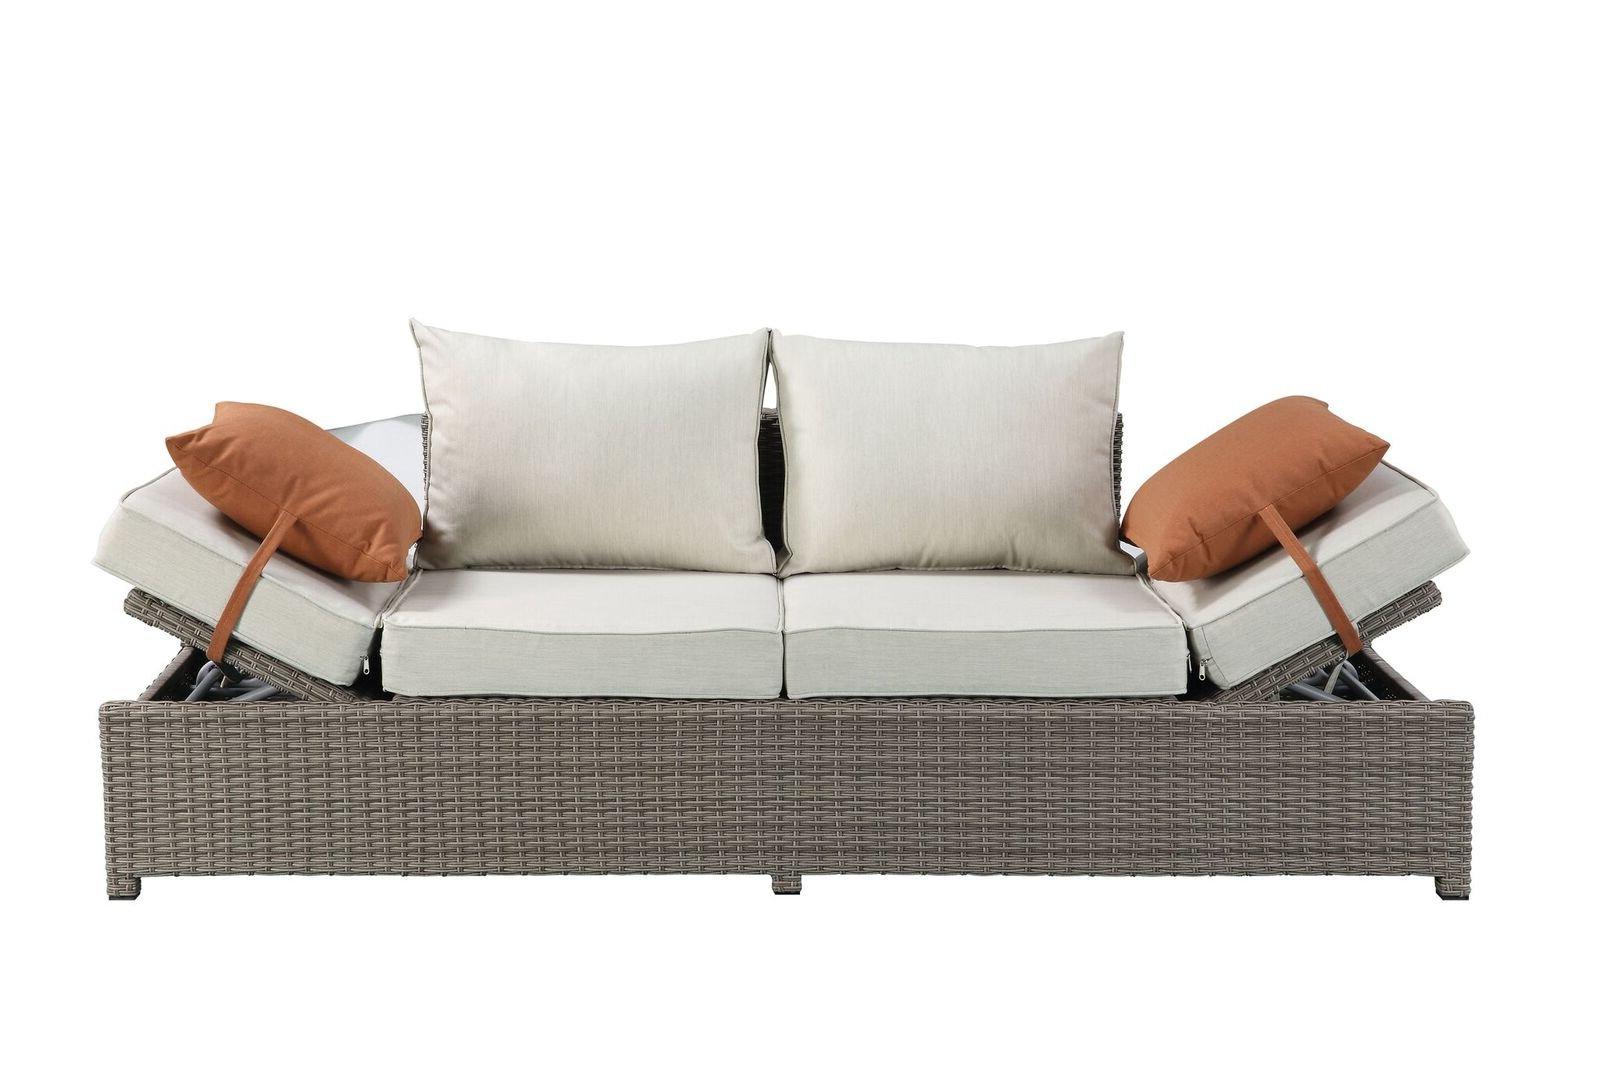 Platt Patio Sofa With Cushions Pertaining To Well Known Clifford Patio Sofas With Cushions (View 16 of 20)